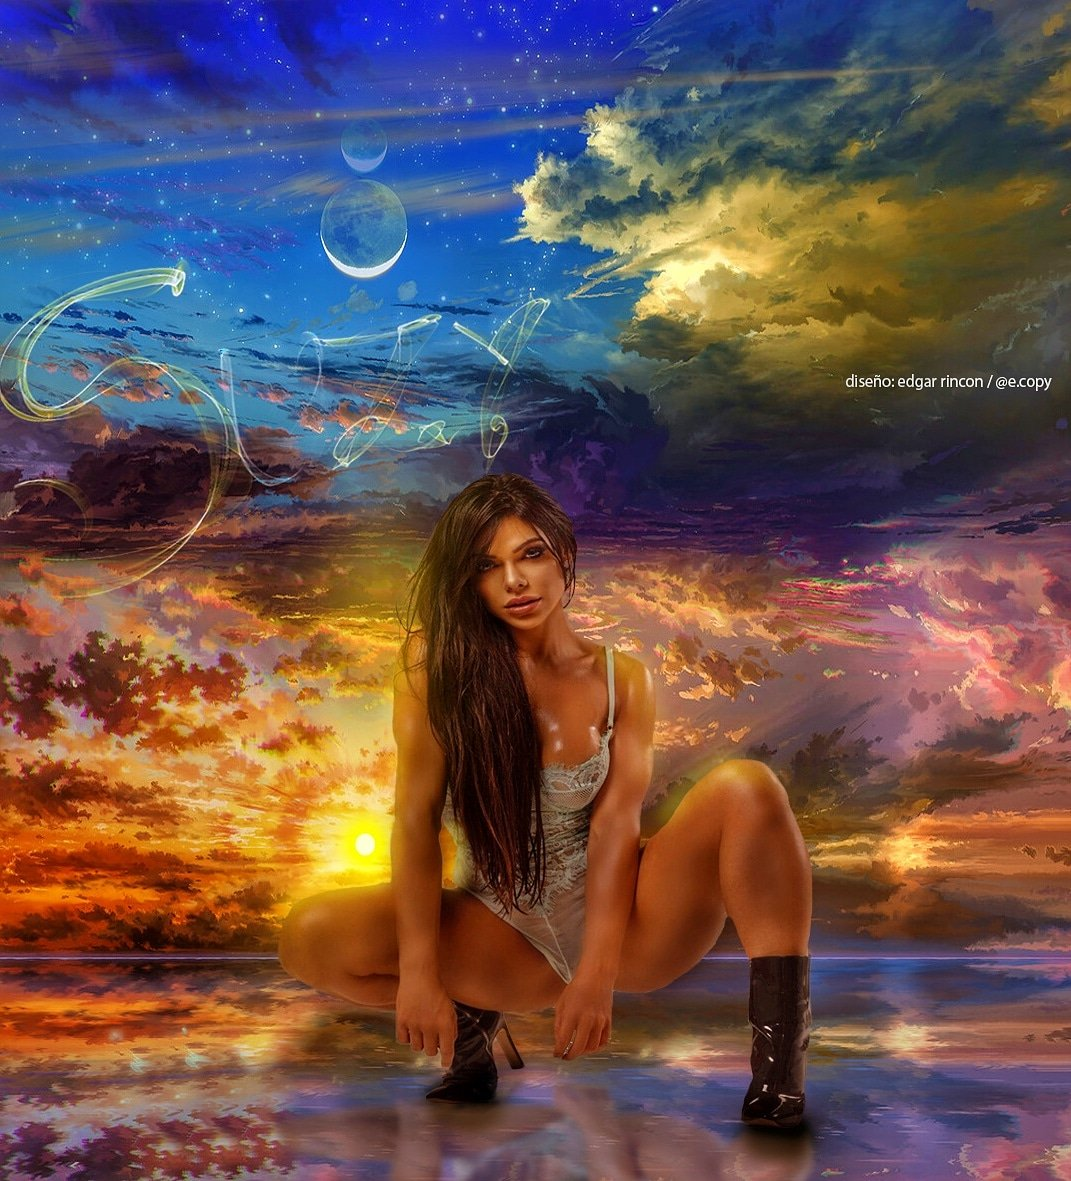 RT @e_copy: La naturaleza siempre lleva los colores del espiritu @SuzyCortez_  artwork #UFC240 https://t.co/4A3hsgDkF4